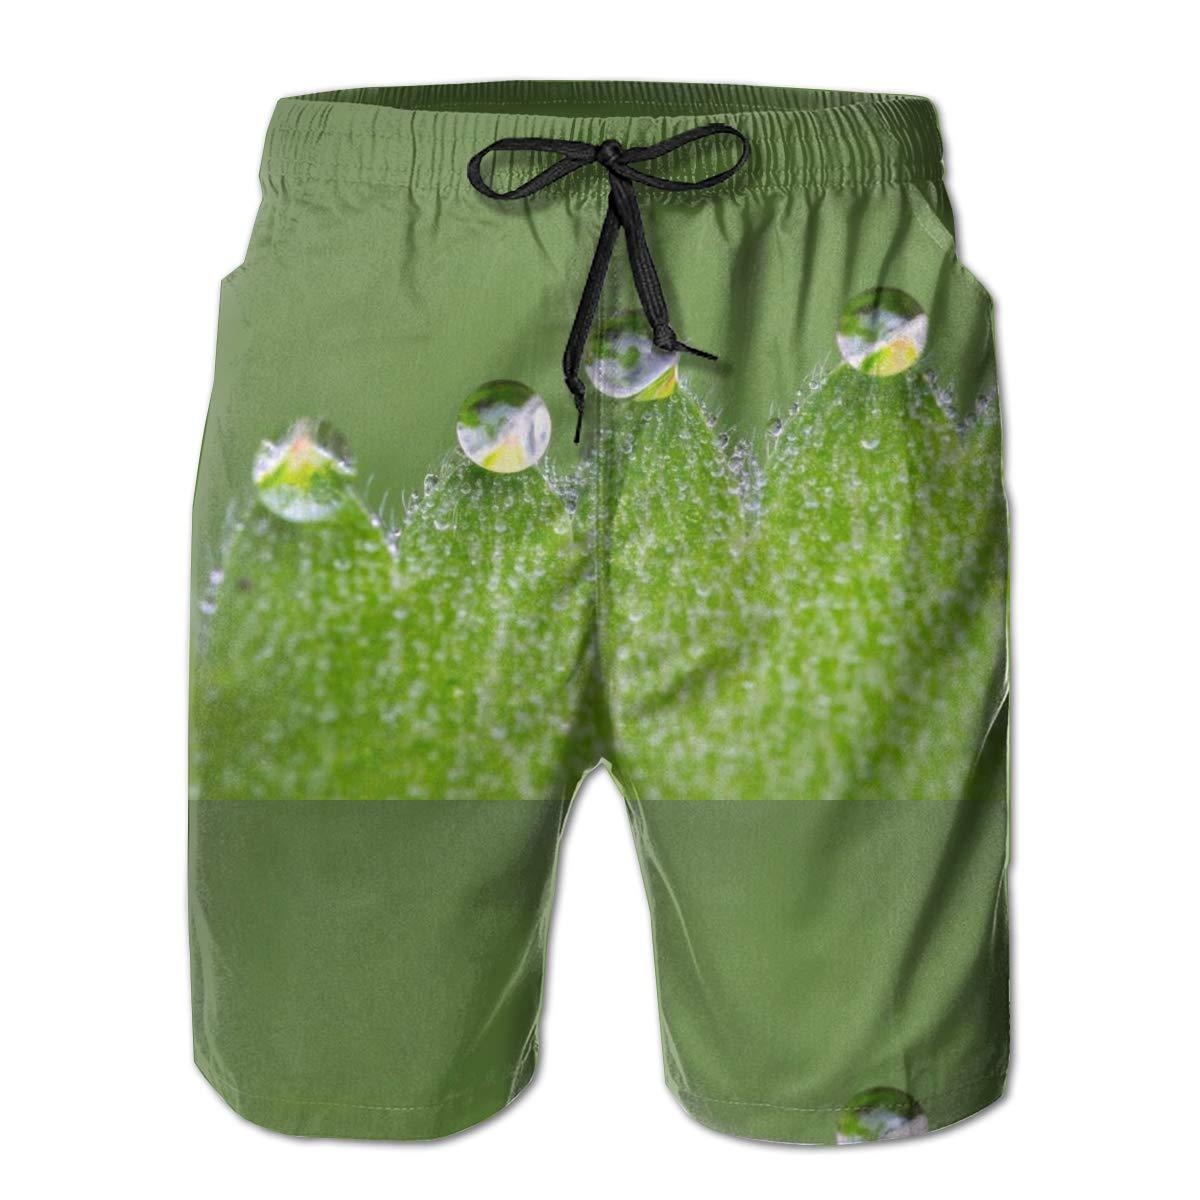 Jngjs Mens Quick Dry Swimming Short with Drawstring Beach Shorts